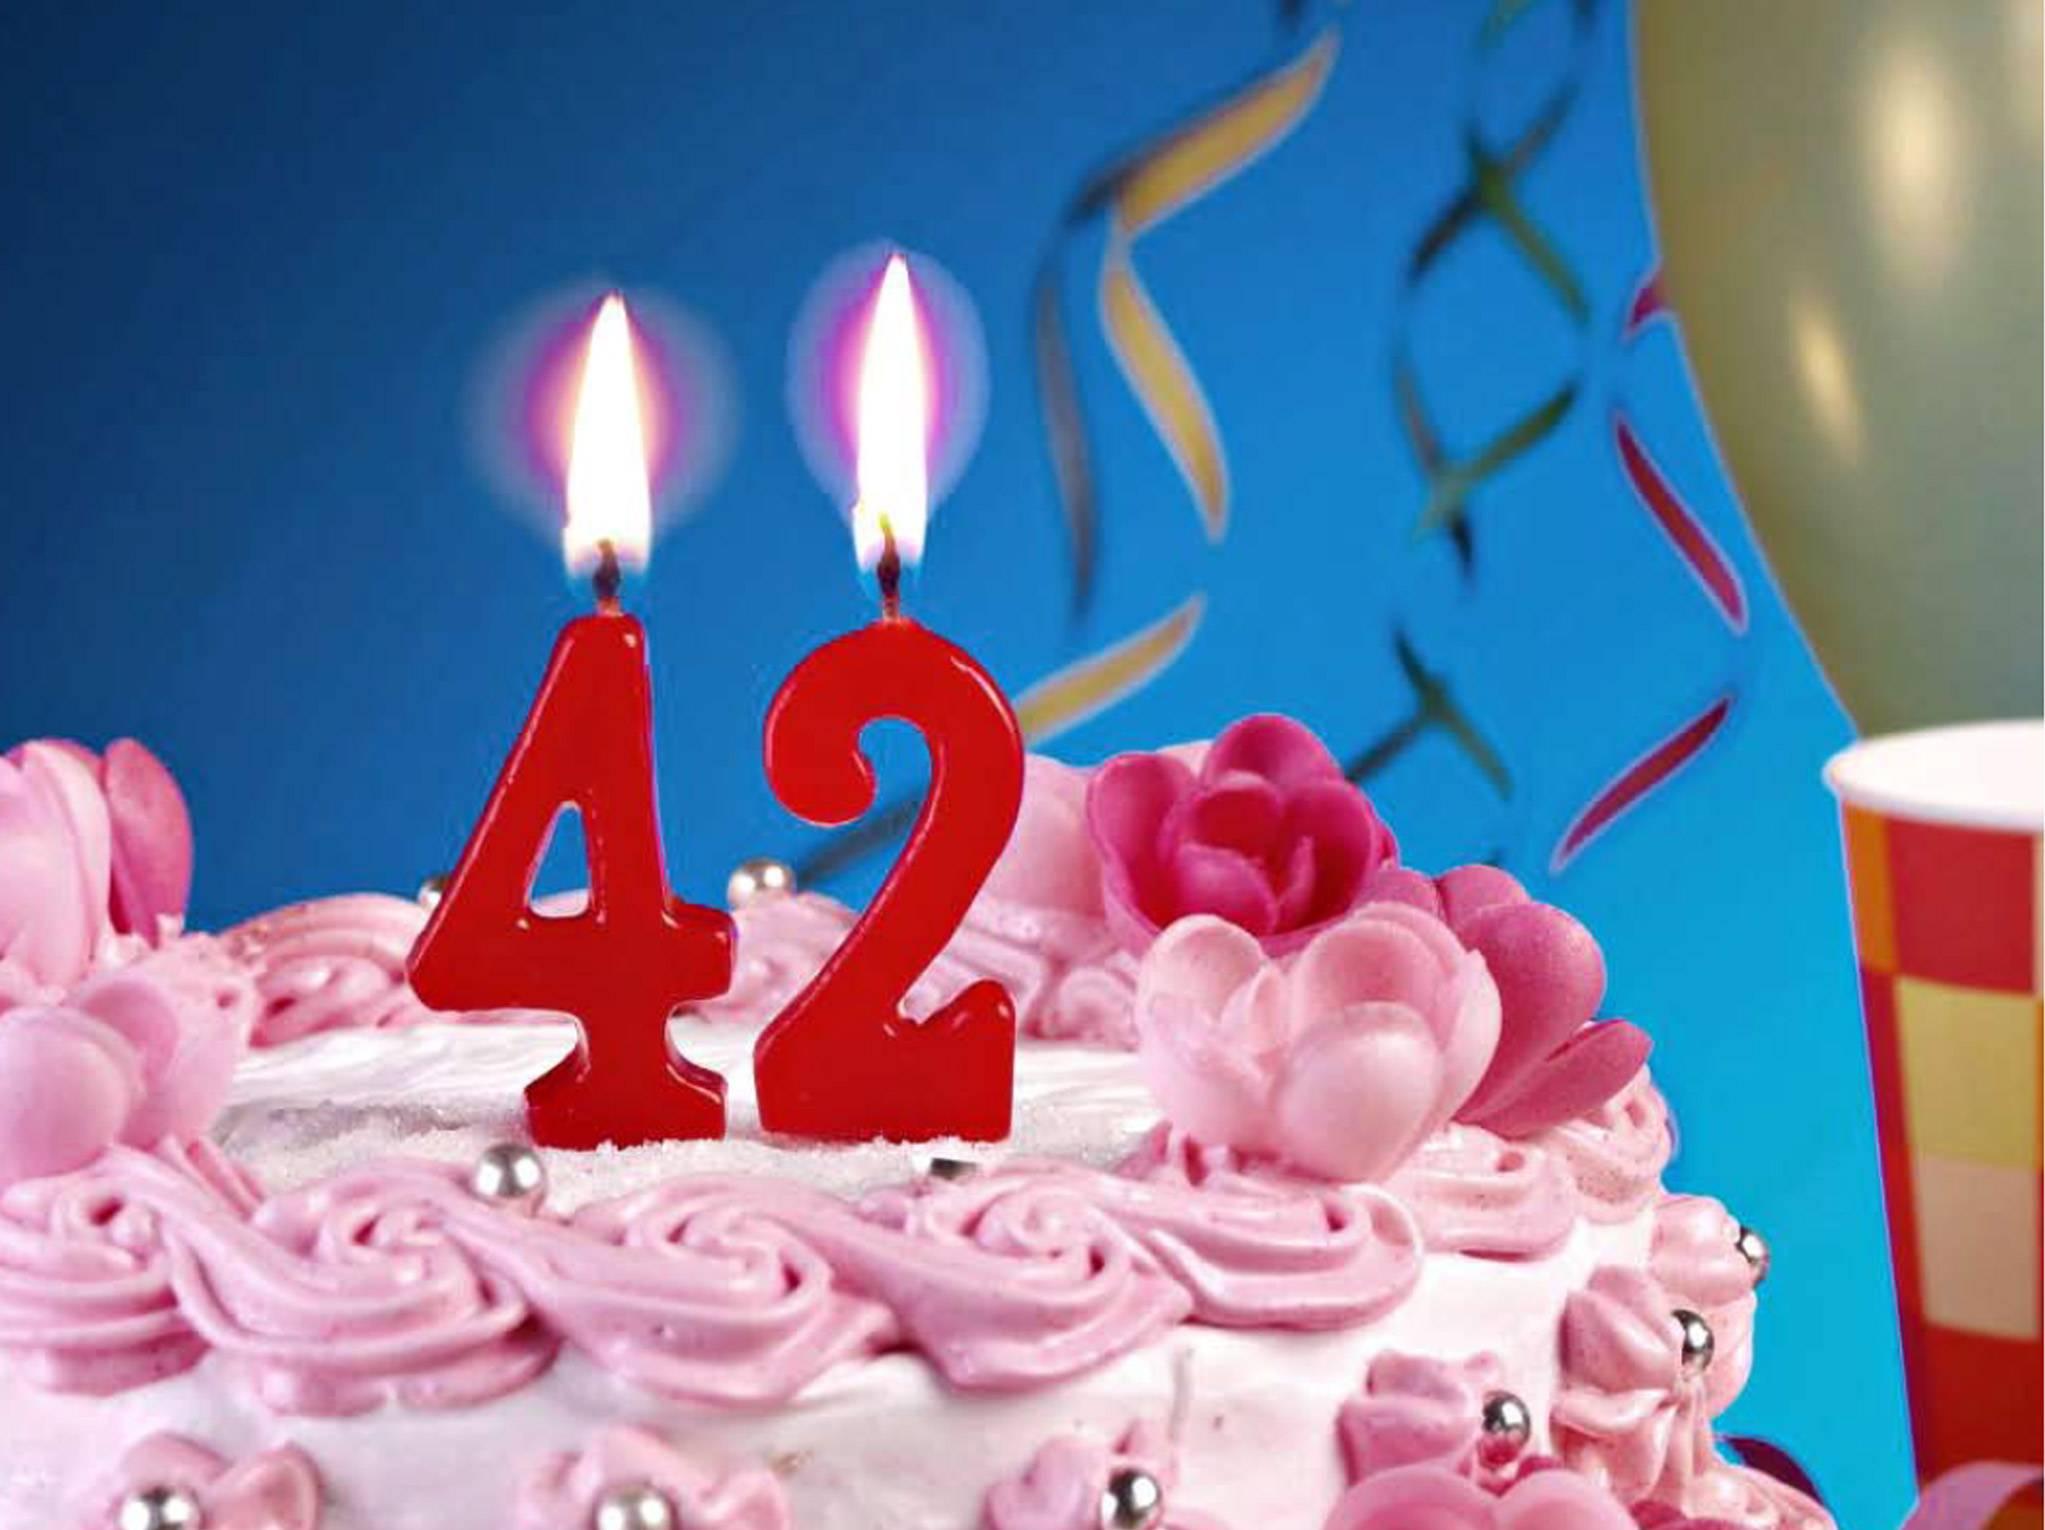 Phenomenal 6 42Nd Birthday Cakes For Mom Photo Happy 42Nd Birthday Cake Funny Birthday Cards Online Fluifree Goldxyz